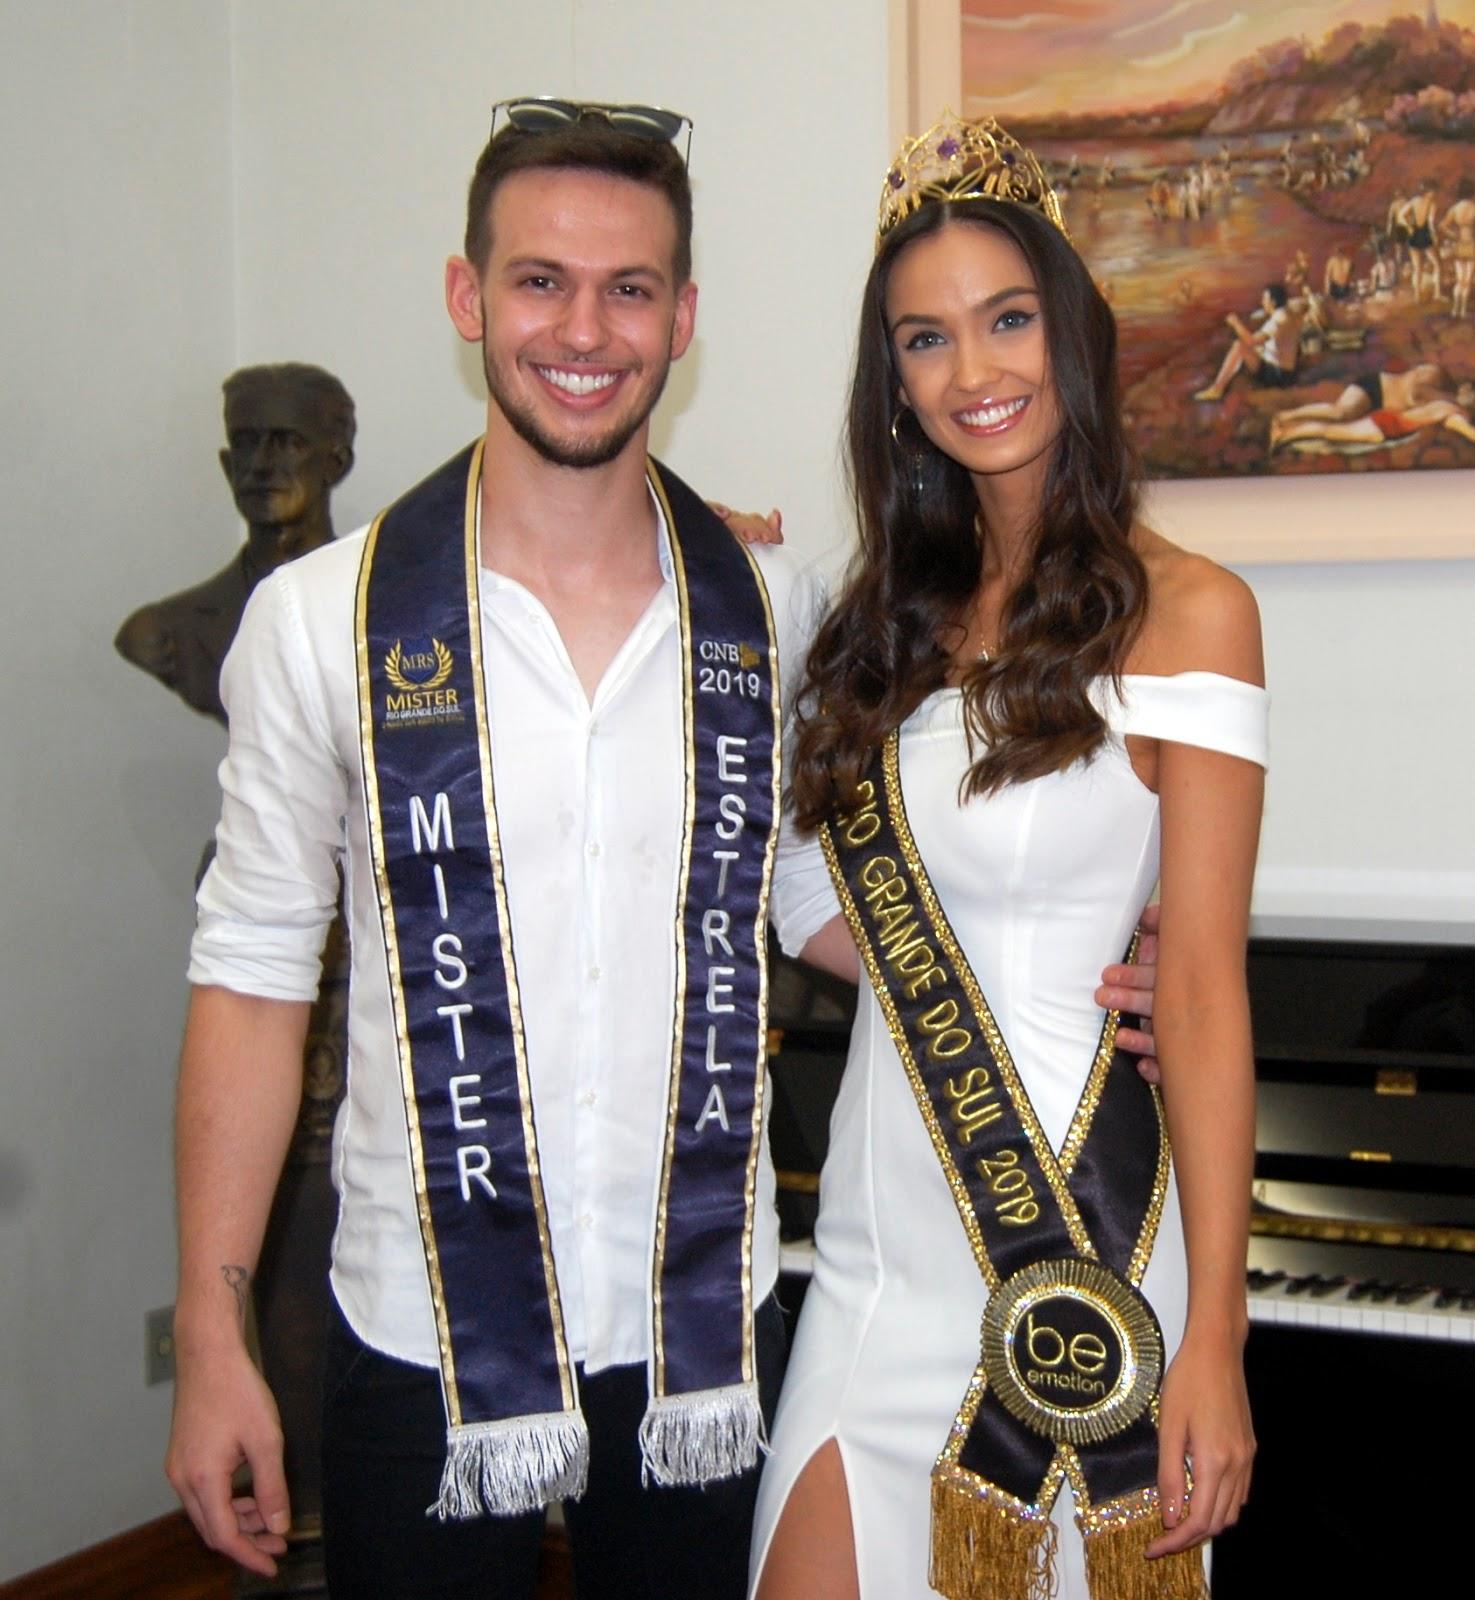 bianca scheren, top 5 de miss brasil universo 2019. - Página 5 Dsc_0021